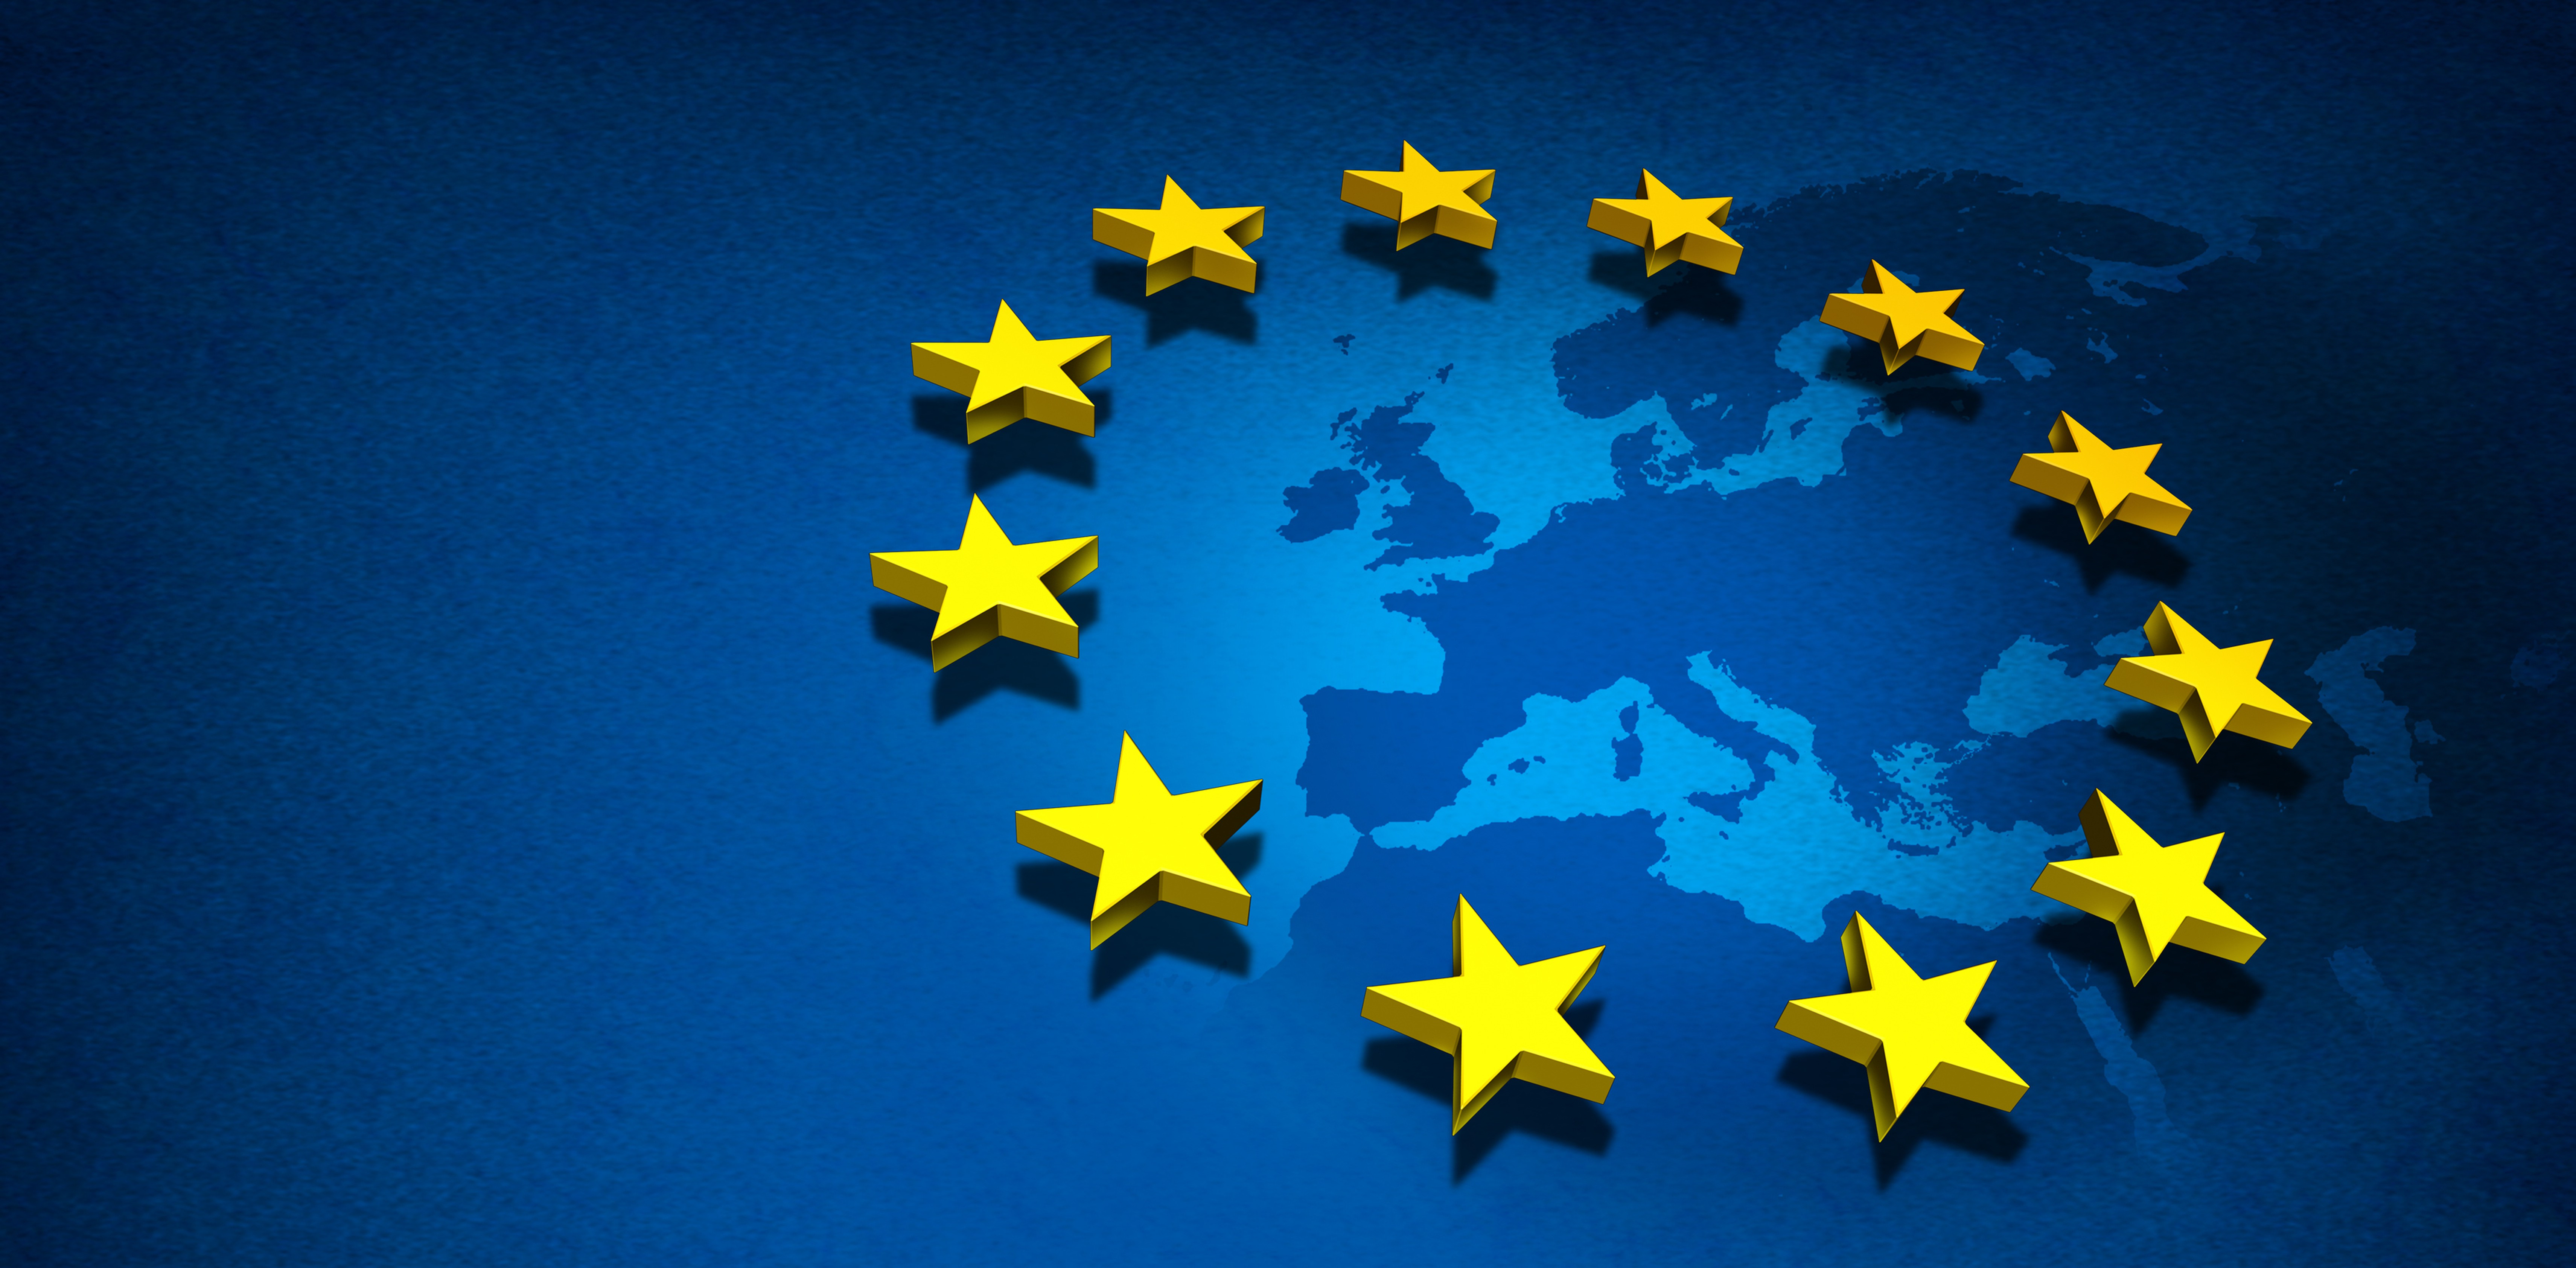 eu action on health benefits us all scotland stronger in europe. Black Bedroom Furniture Sets. Home Design Ideas